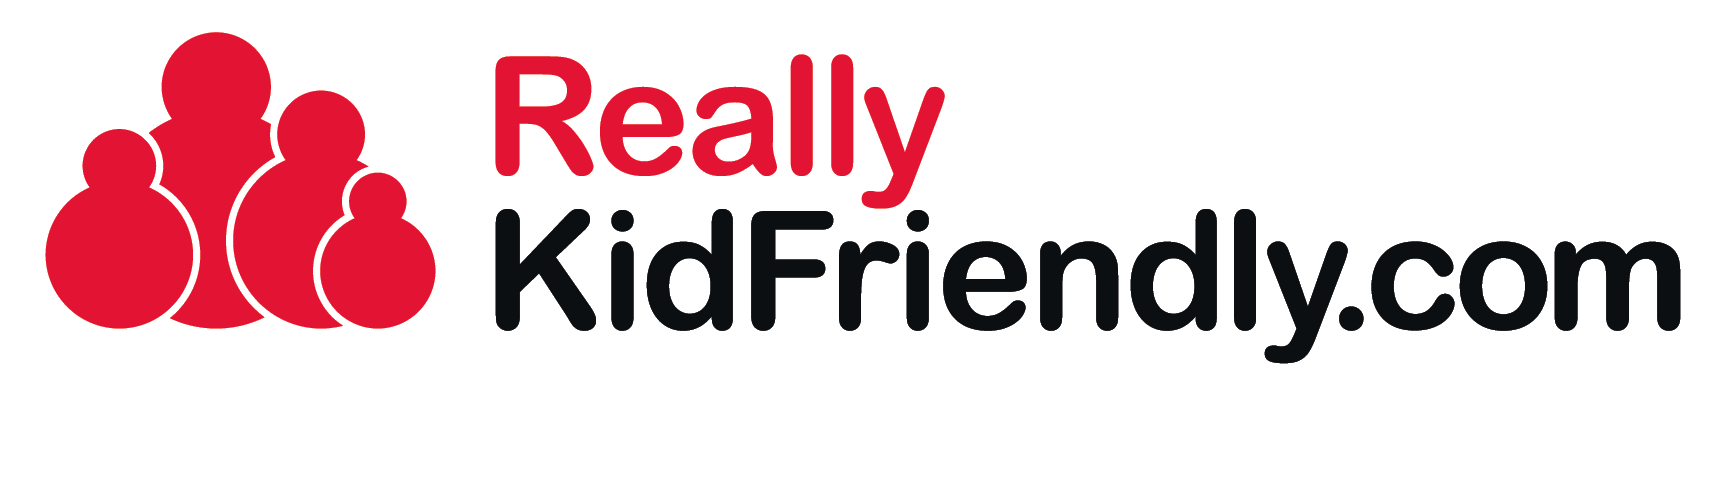 ReallyKidFriendly